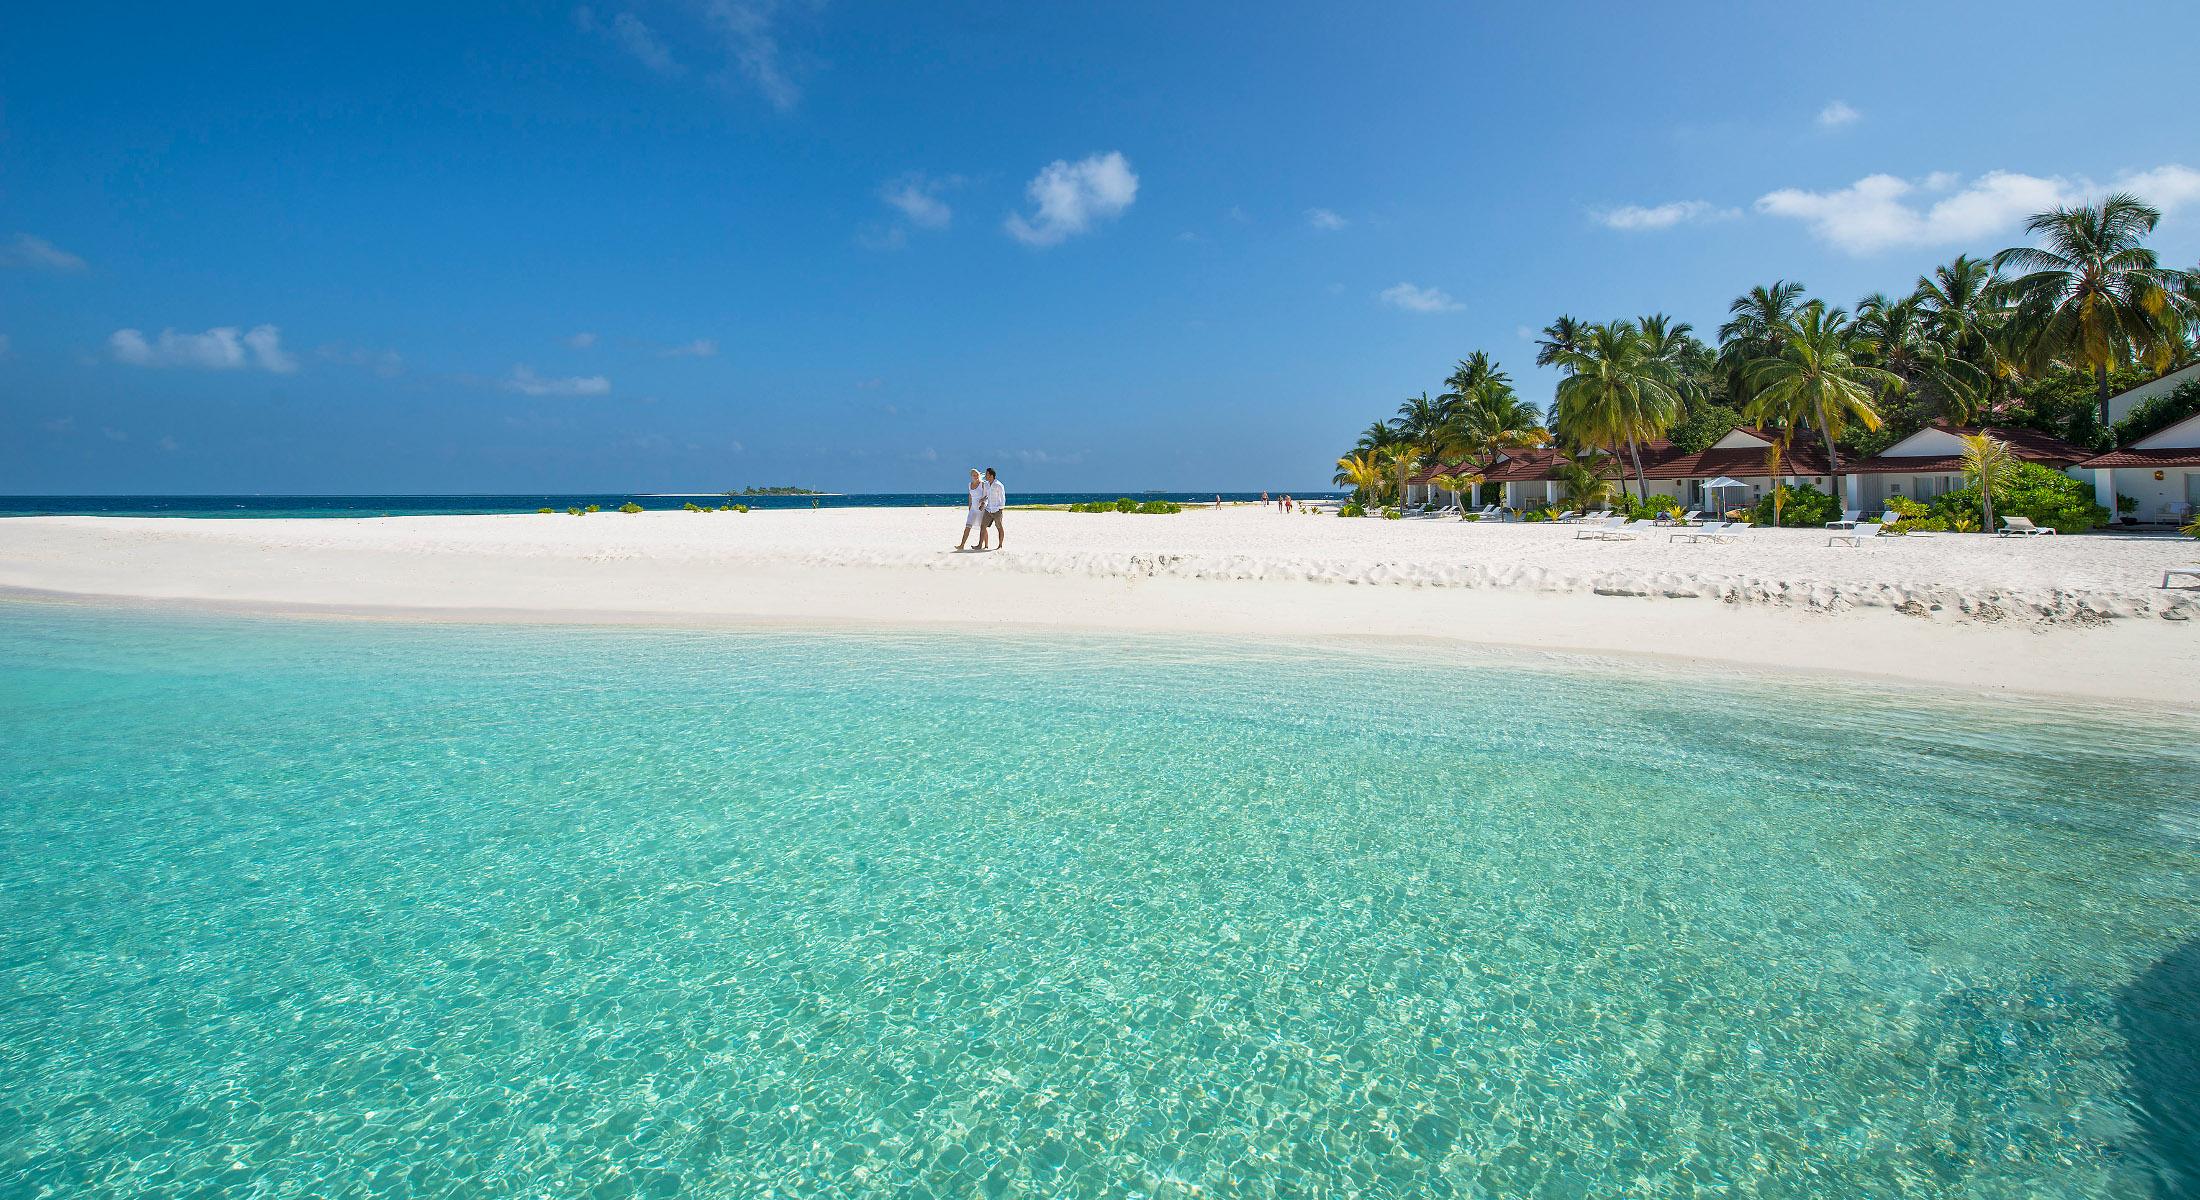 Ari Atoll, Maldives  № 1466106 загрузить